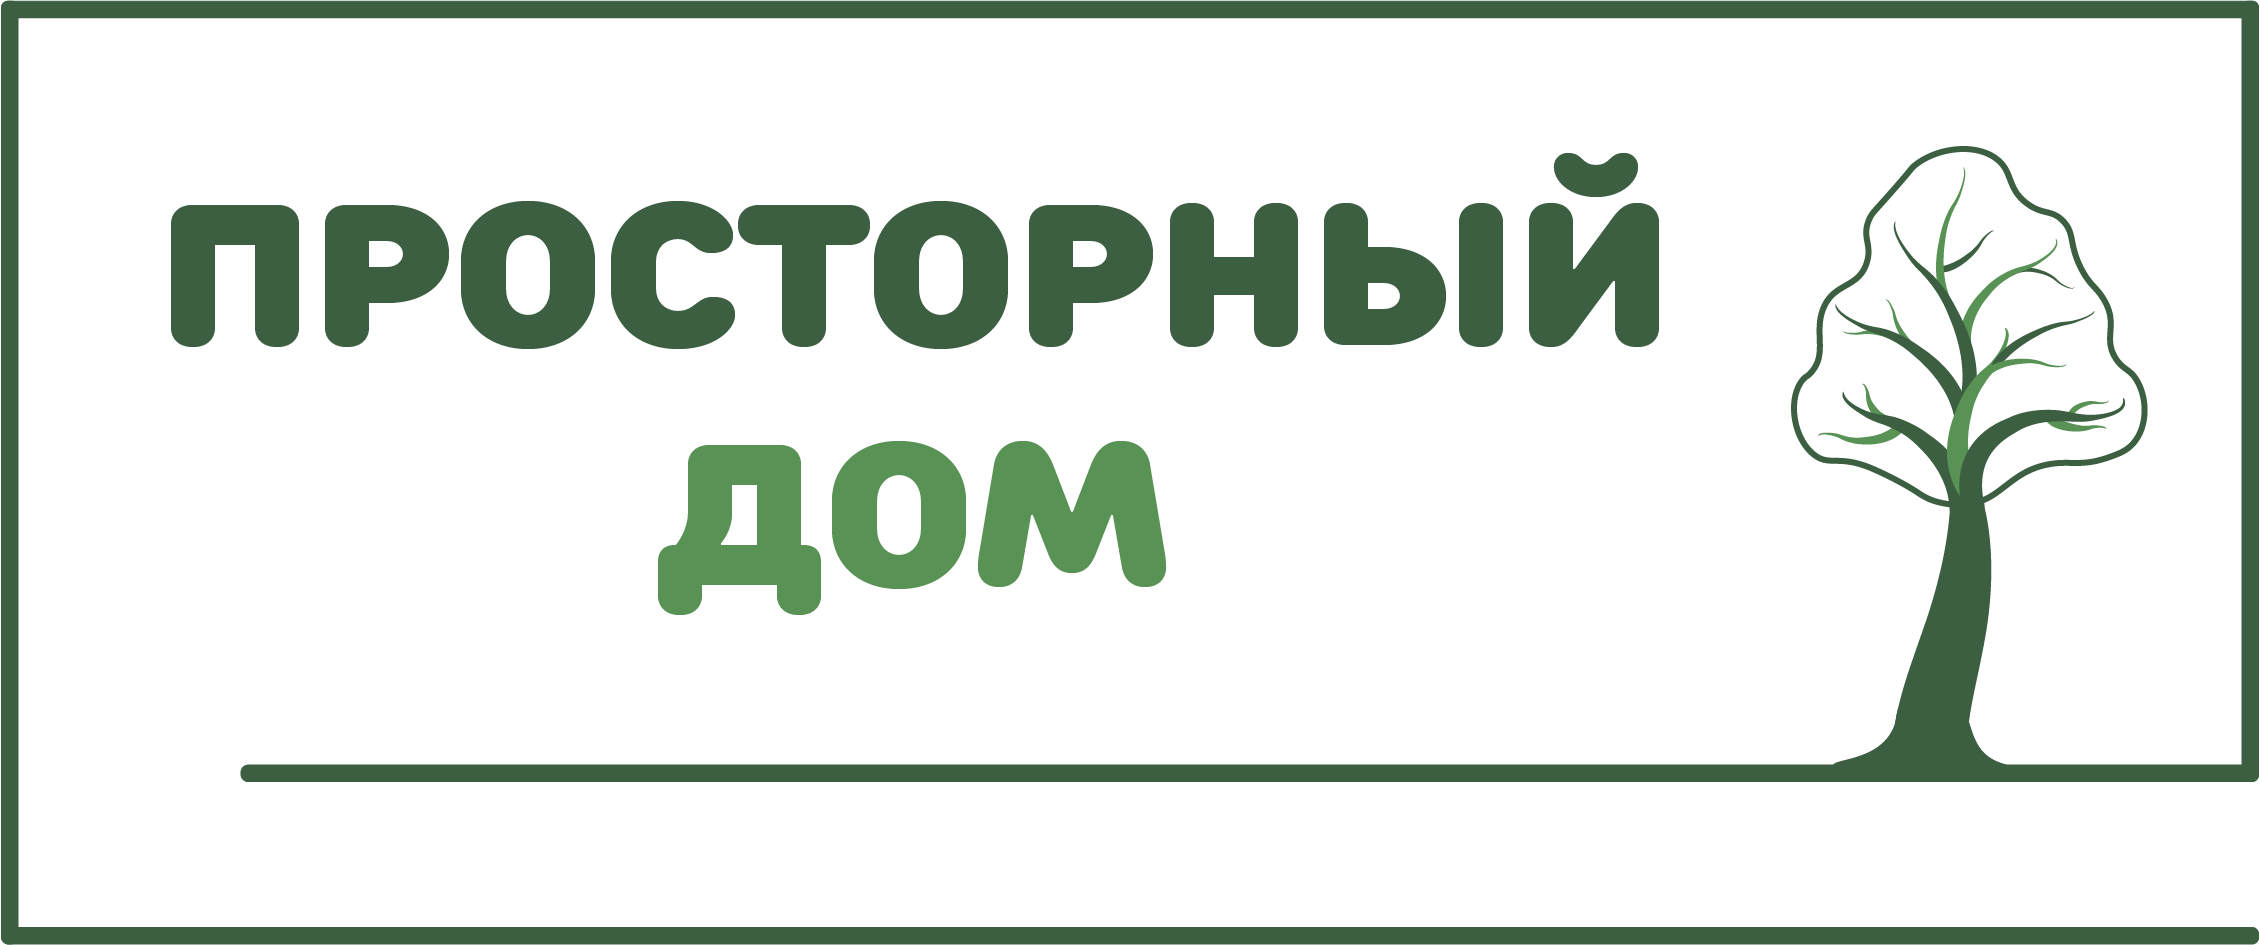 Логотип и фирменный стиль для компании по шкафам-купе фото f_3335b6c47e94b3cb.png